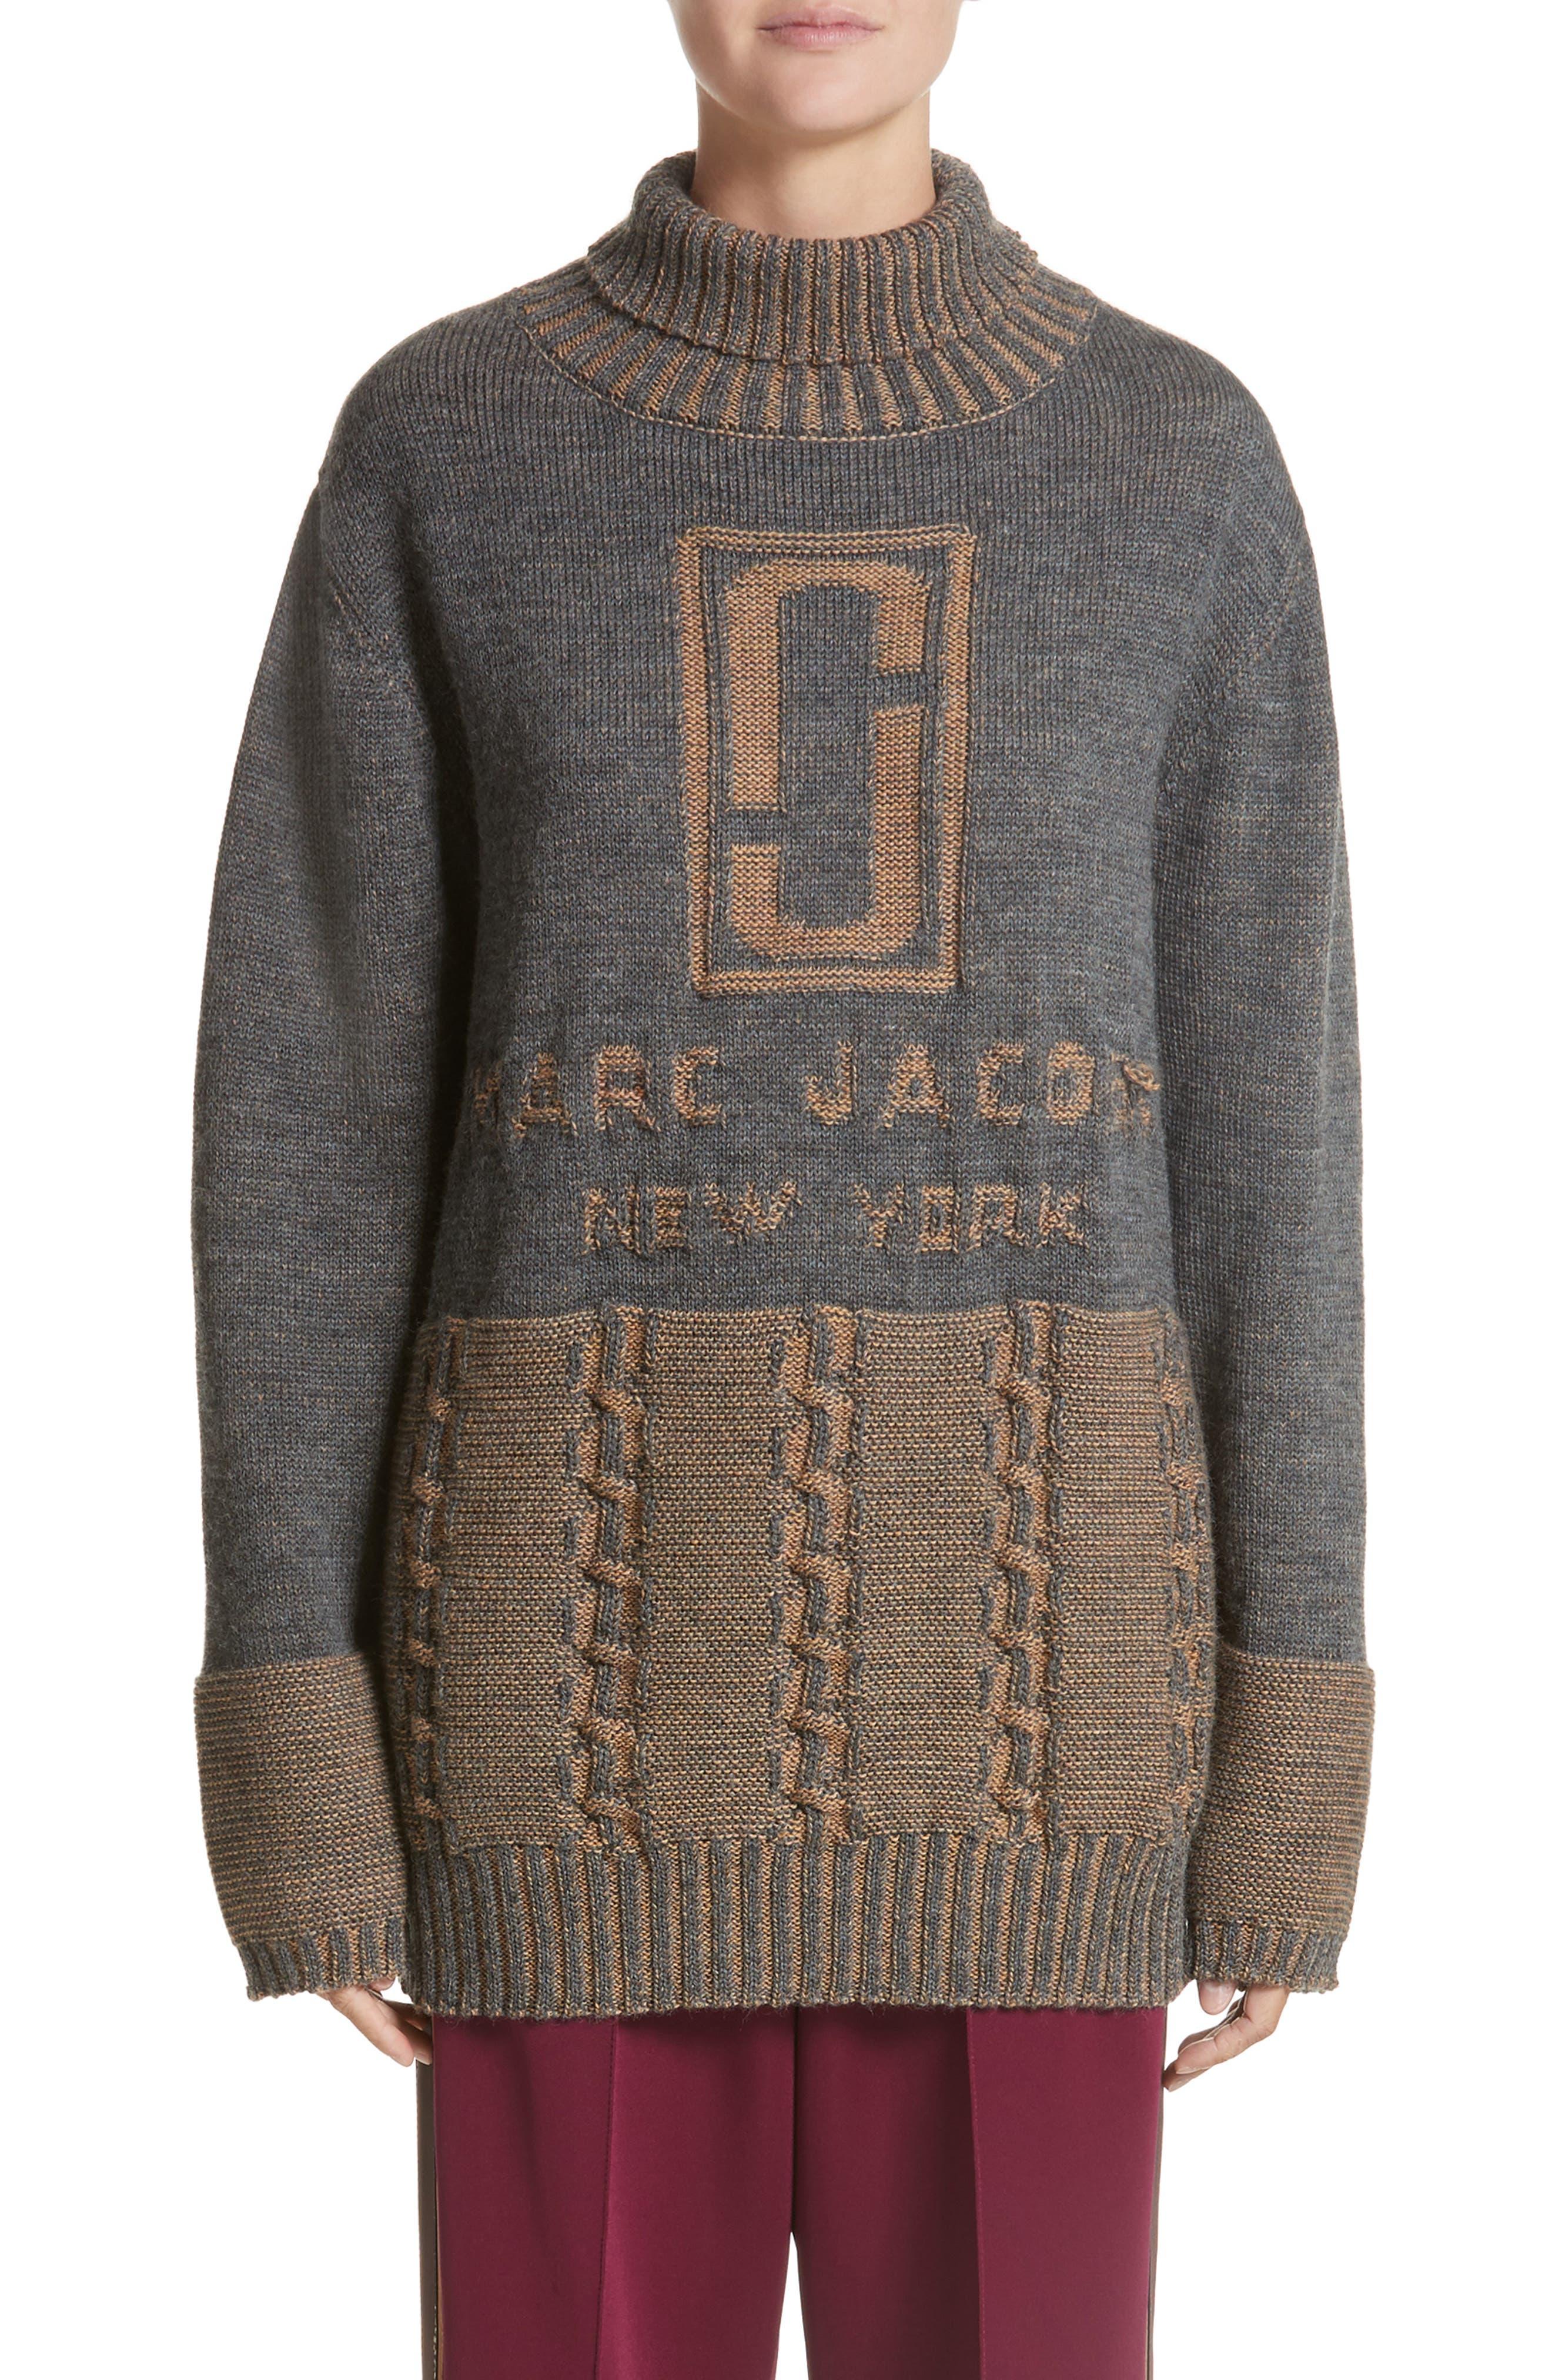 Main Image - MARC JACOBS Logo Knit Oversized Turtleneck Sweater